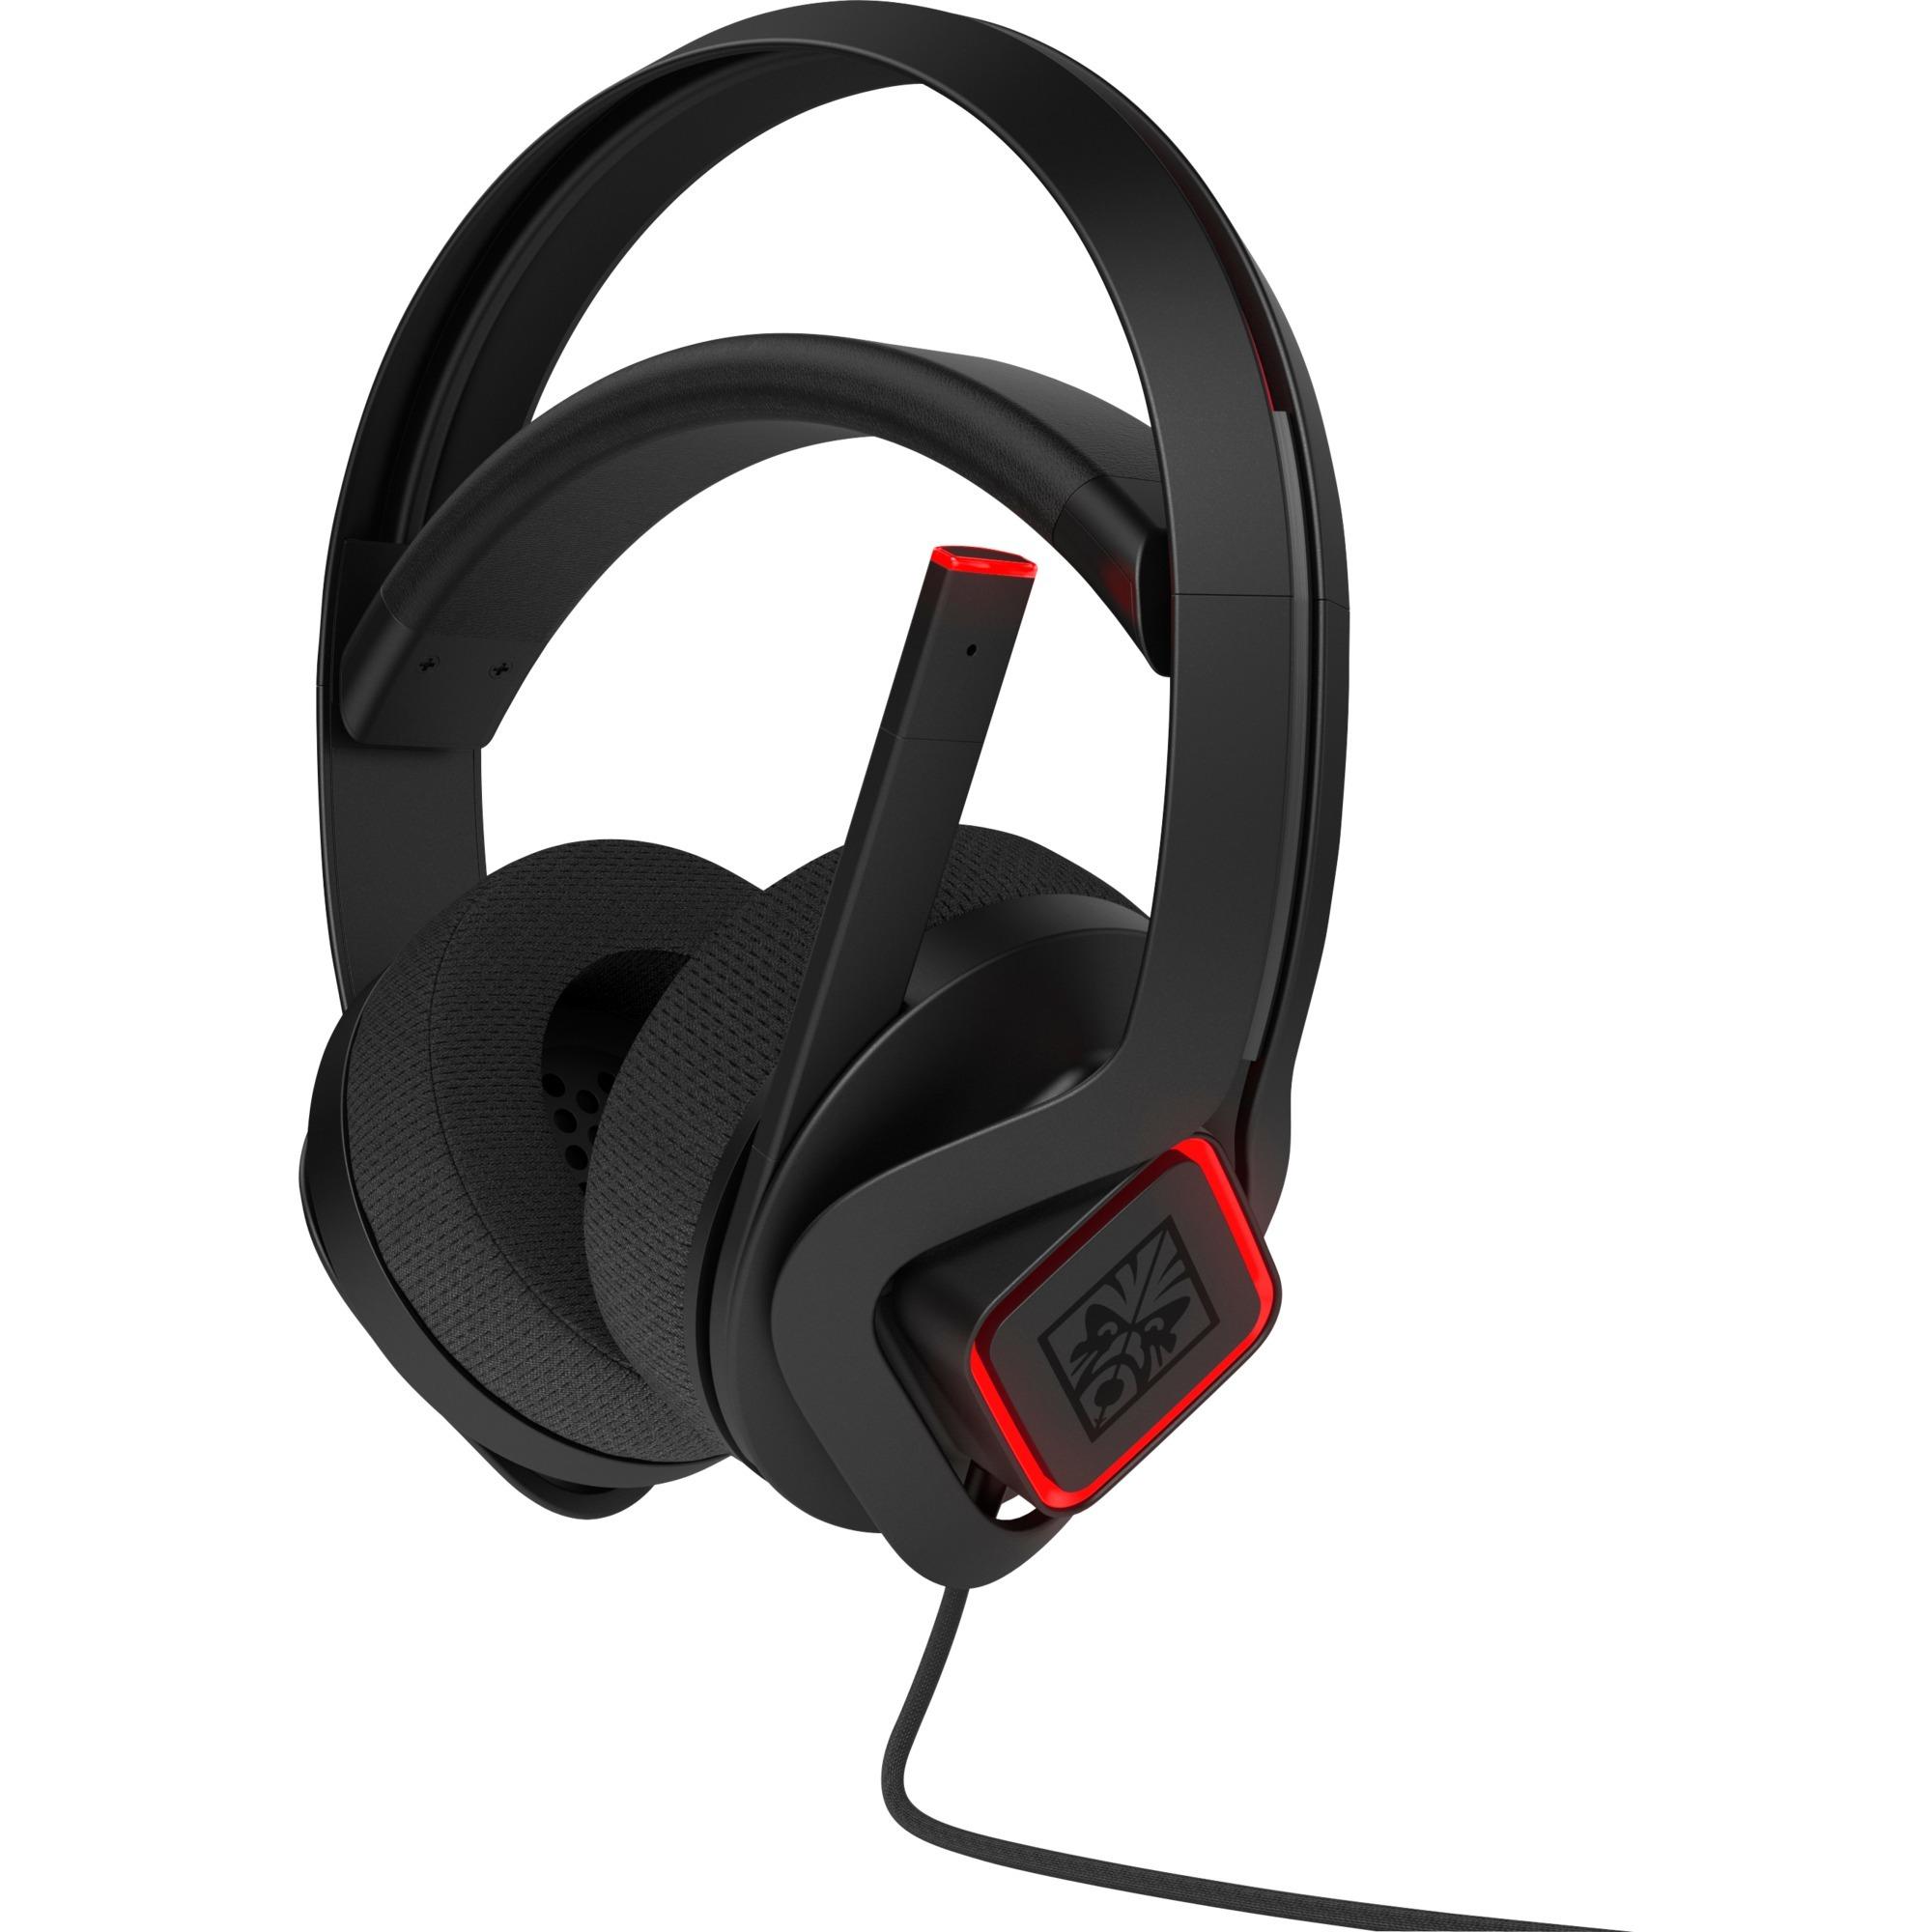 Omen X auricular con micrófono Binaural Diadema Negro, Rojo, Auriculares con micrófono